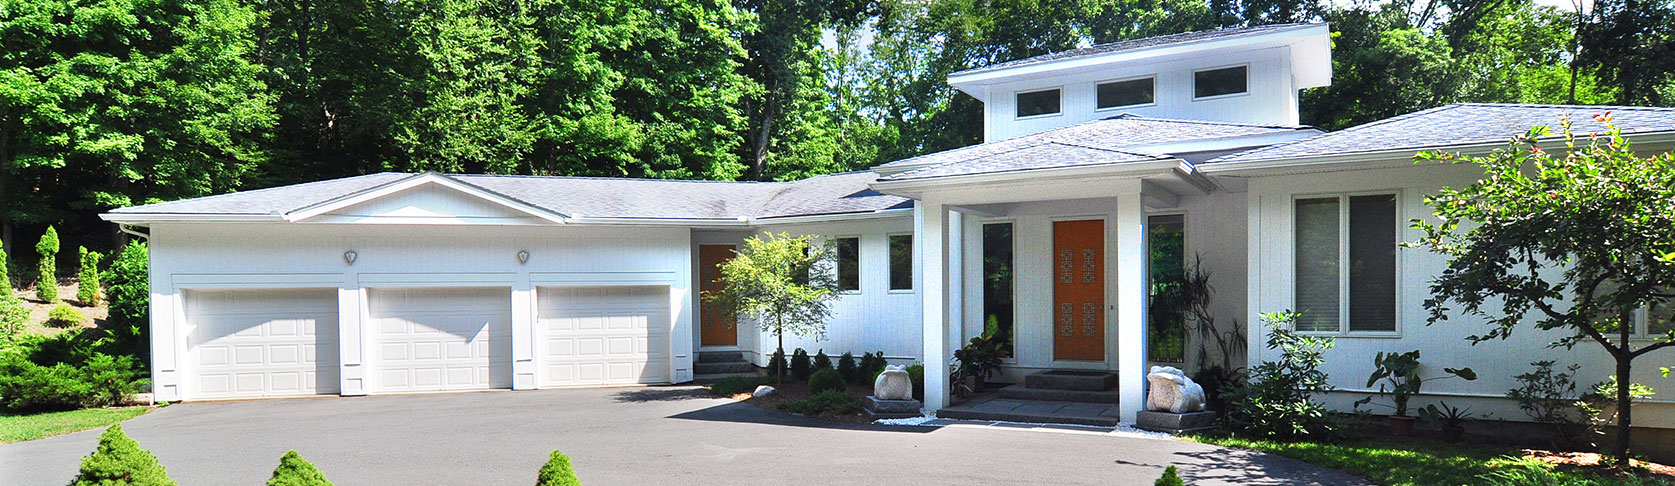 150 Waterville Rd, Farmington, CT